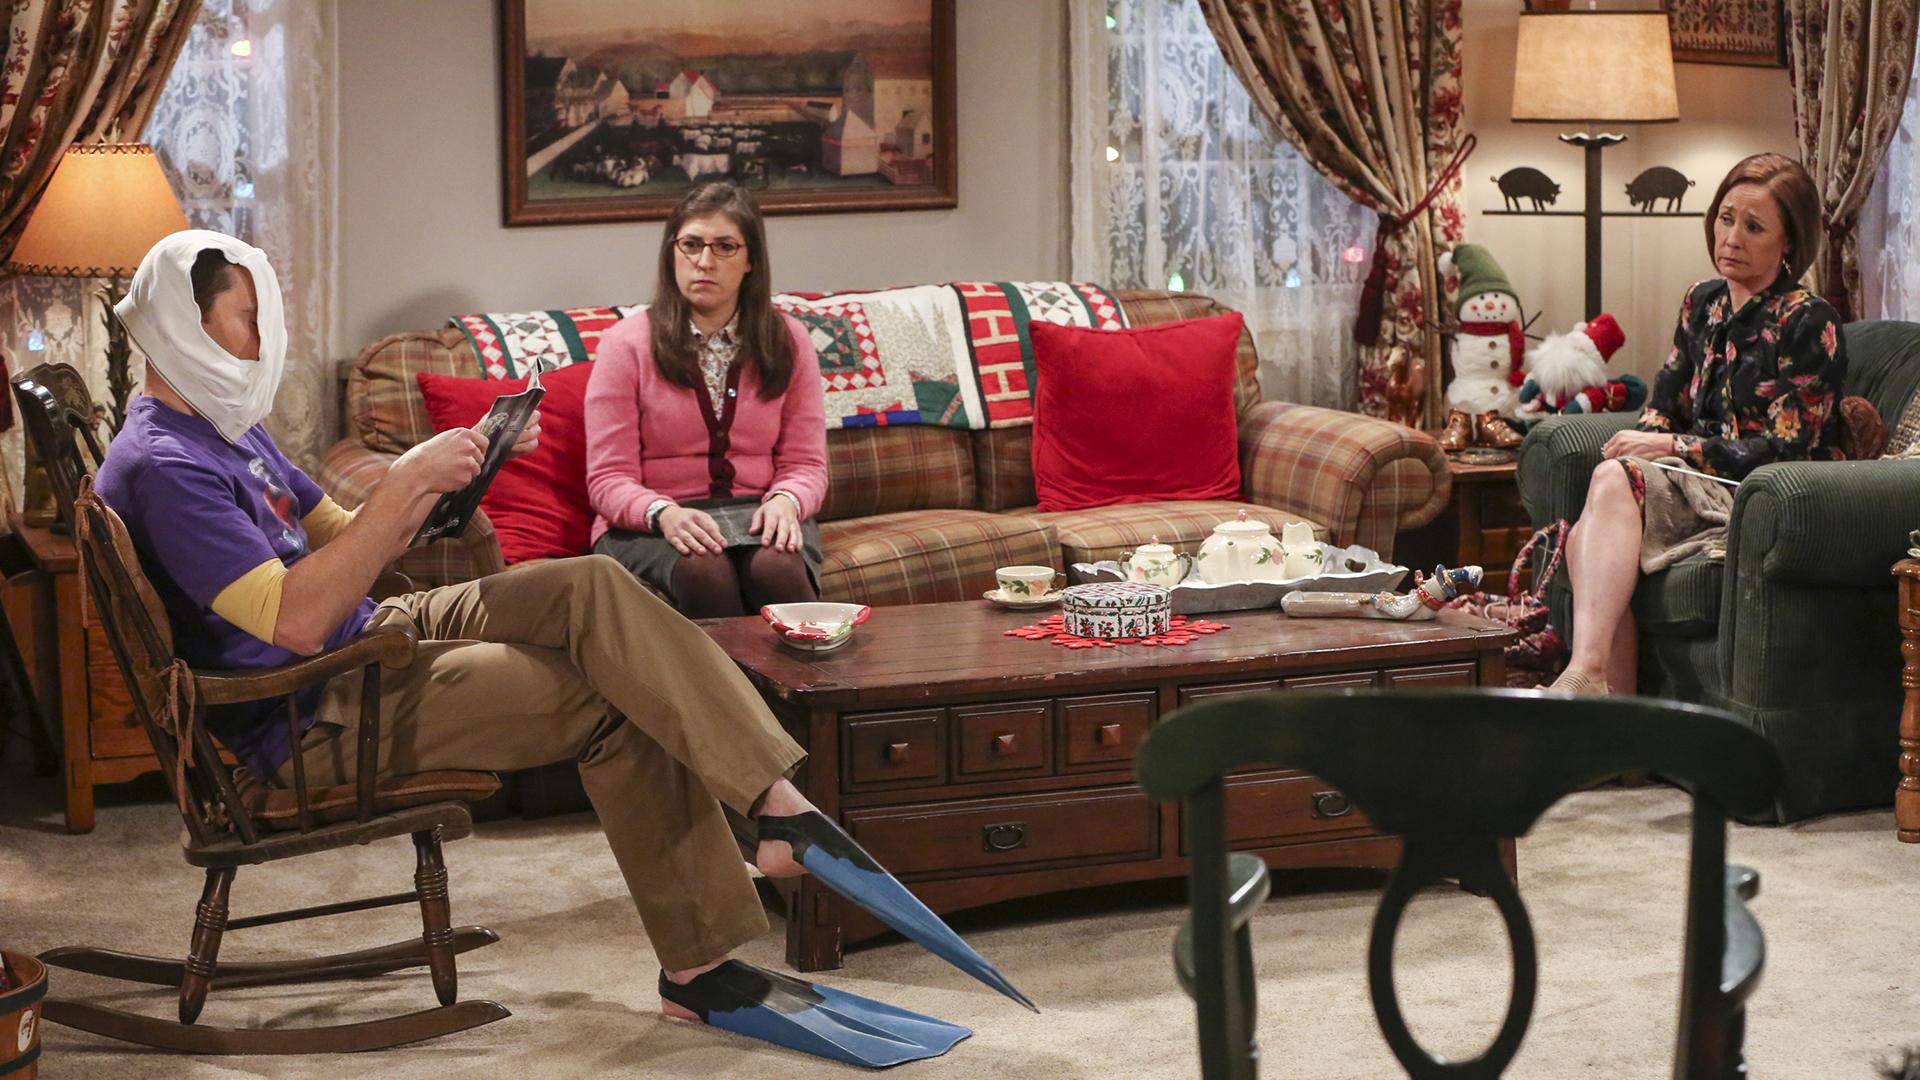 No one throws a tantrum like Sheldon!